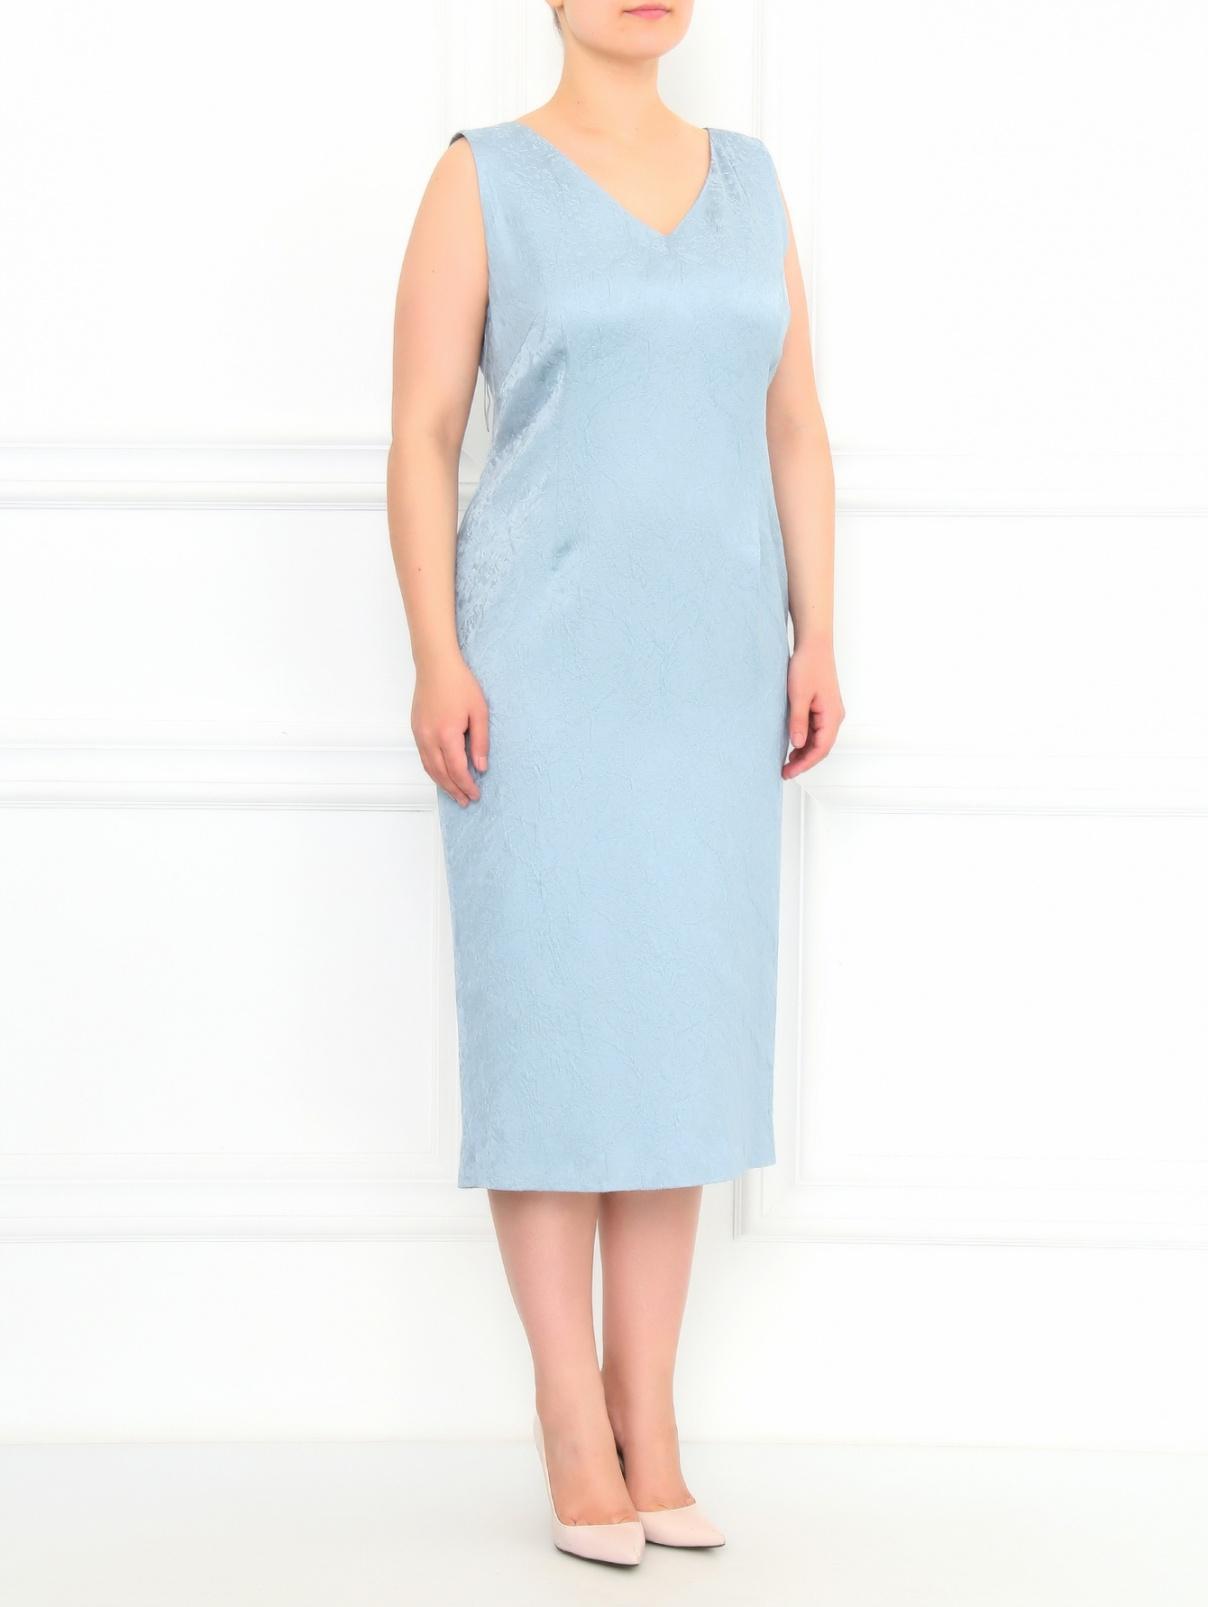 Платье-футляр без рукавов Marina Rinaldi  –  Модель Общий вид